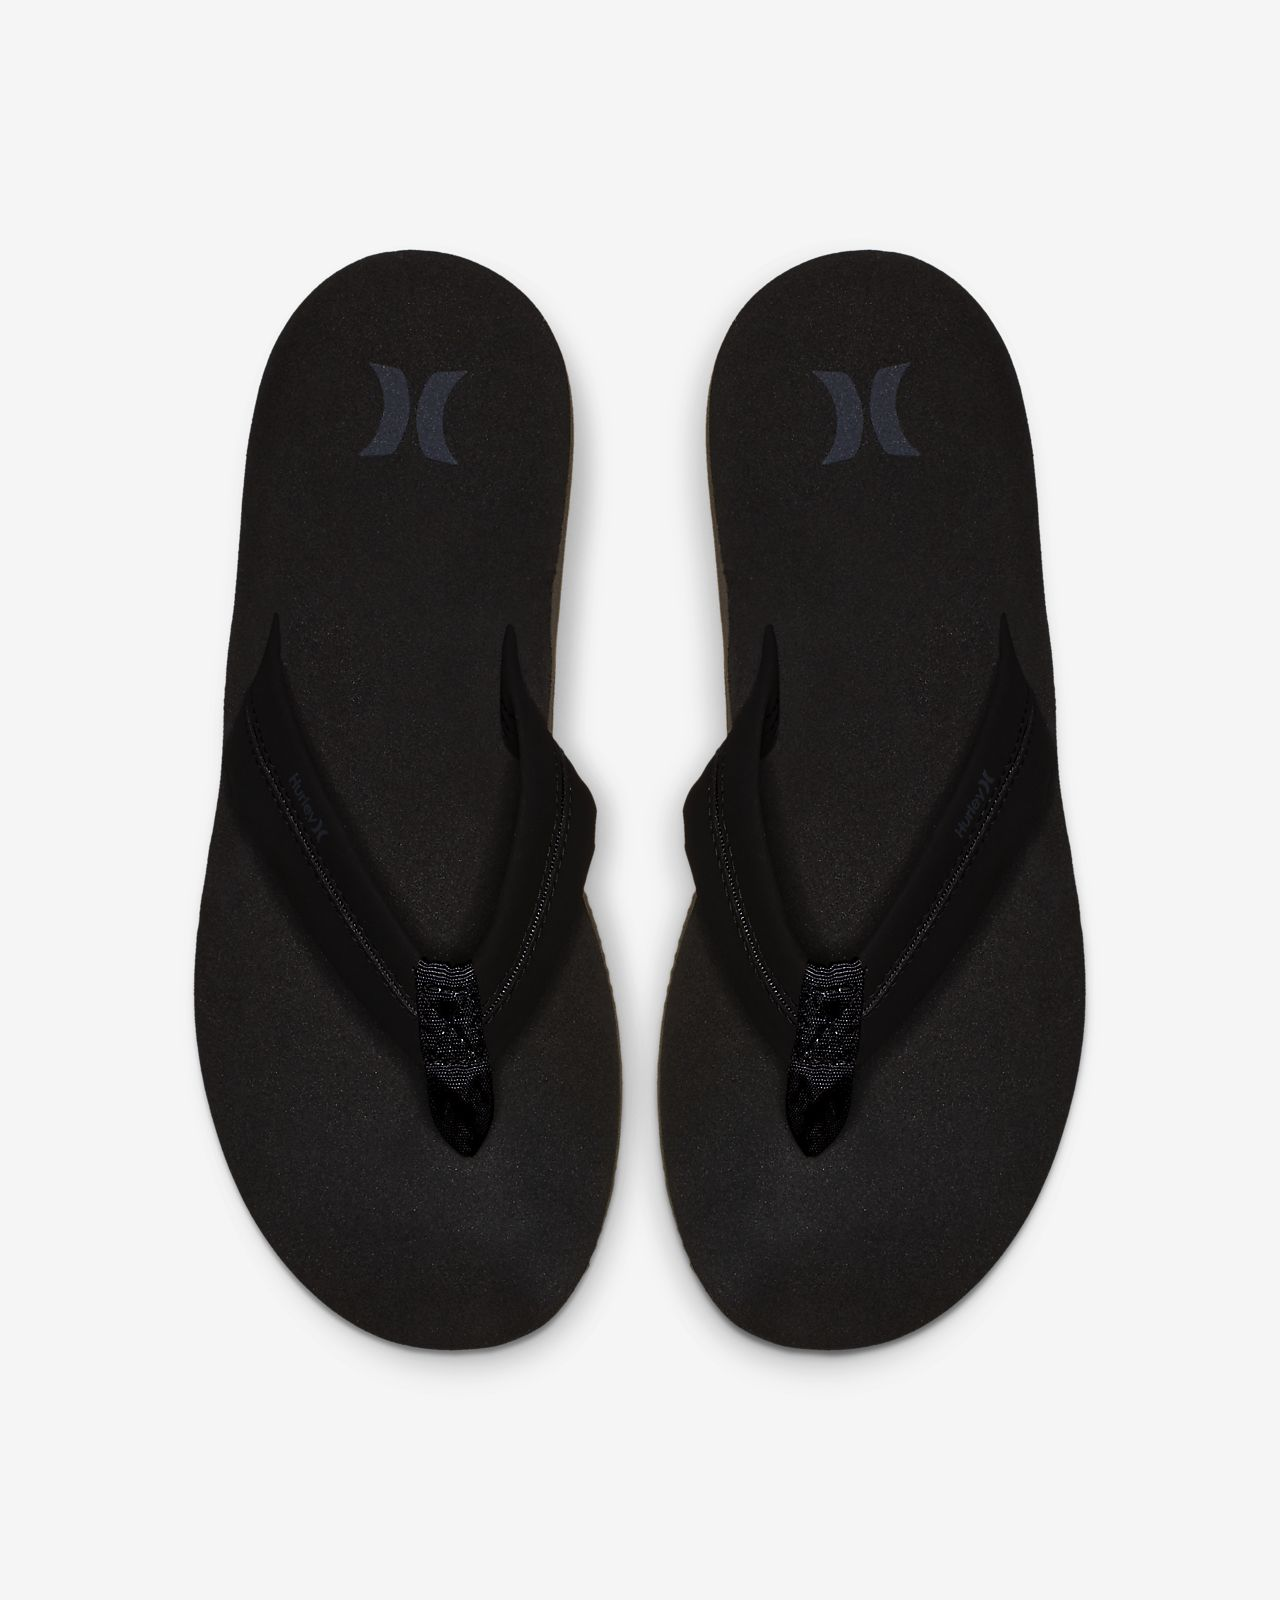 Hurley Lunar Men's Sandals. Nike.com